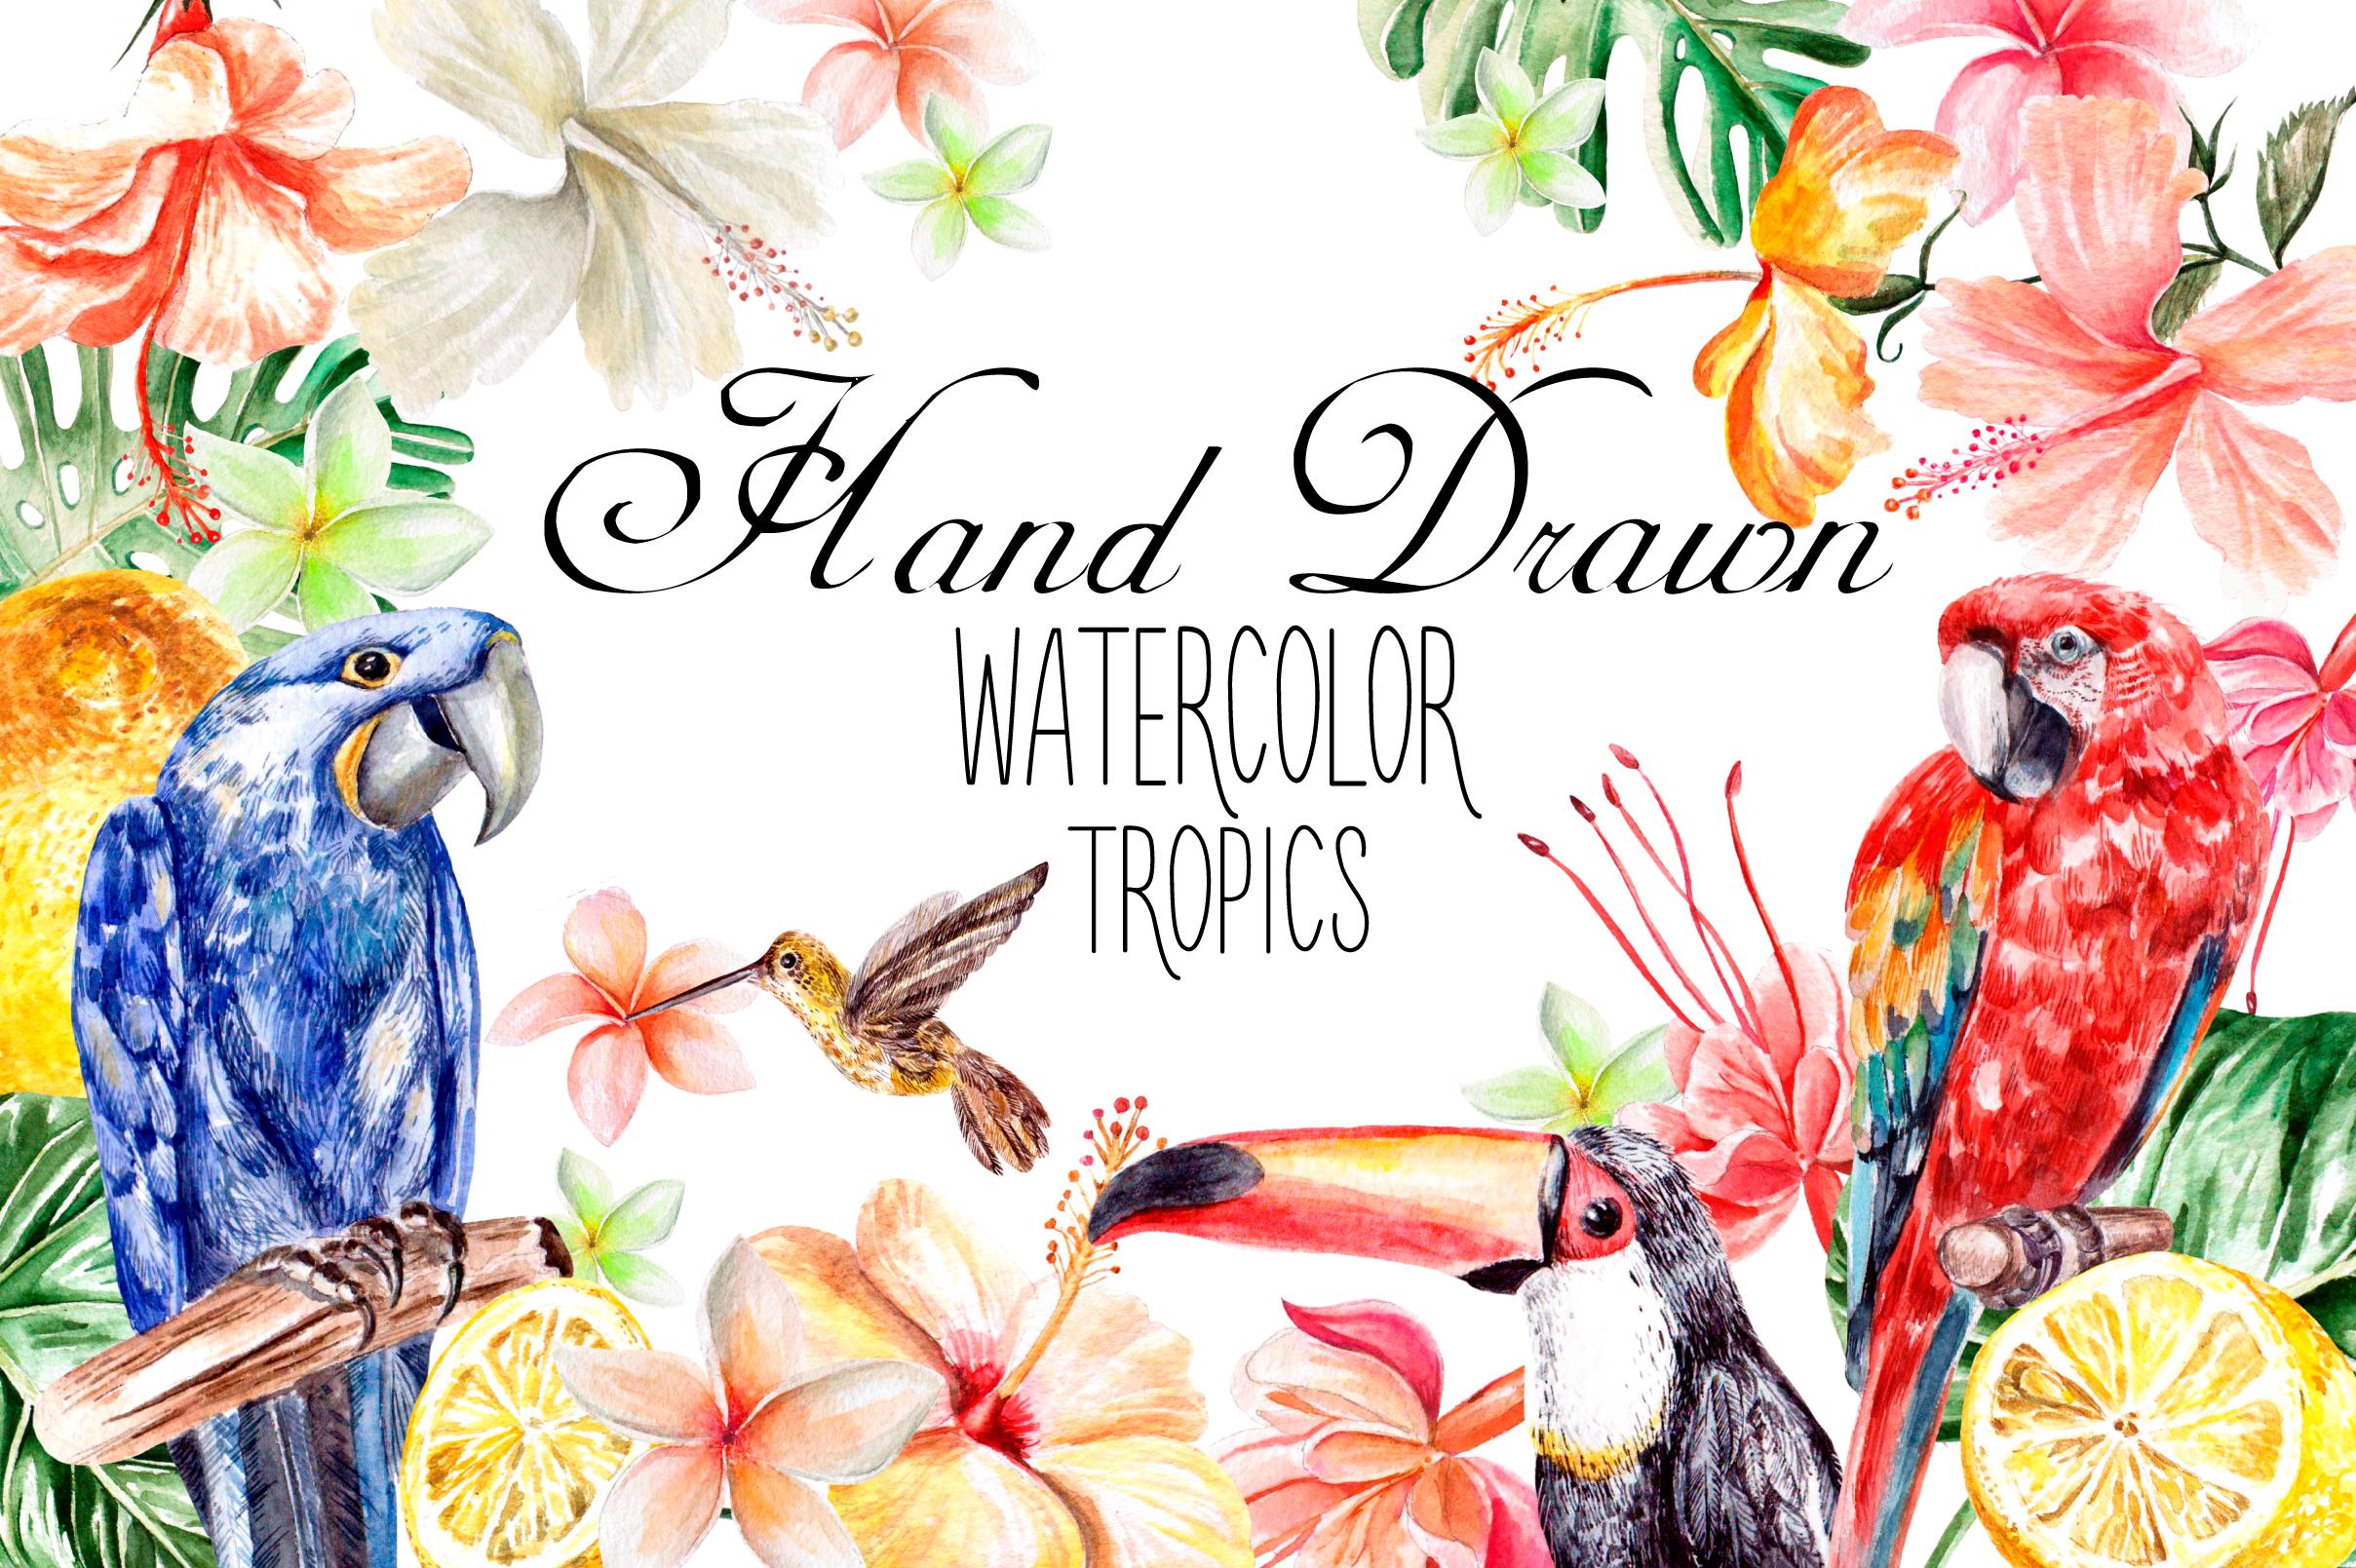 Hand Drawn watercolor TROPICS example image 1